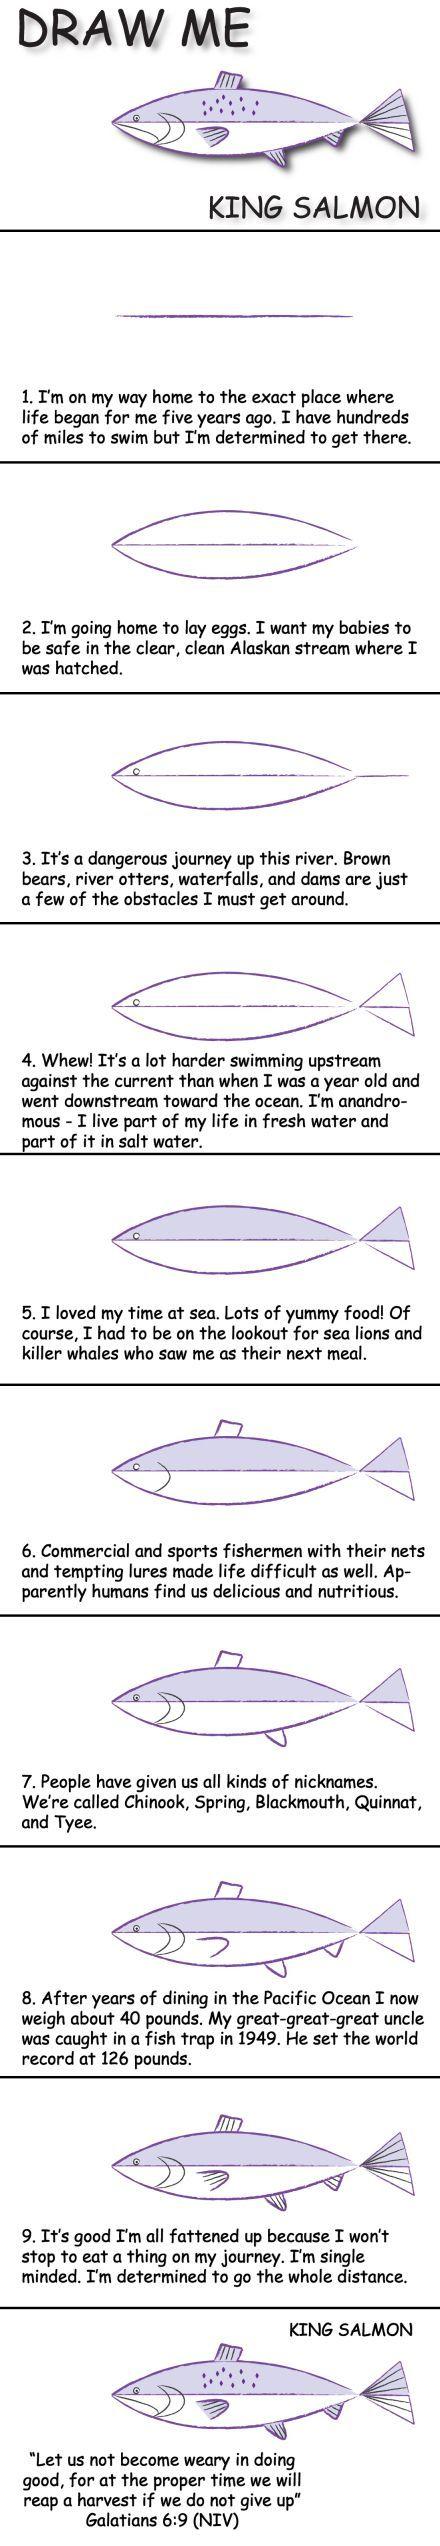 25 best Salmon Fun images on Pinterest   Teaching ideas, Funny ...